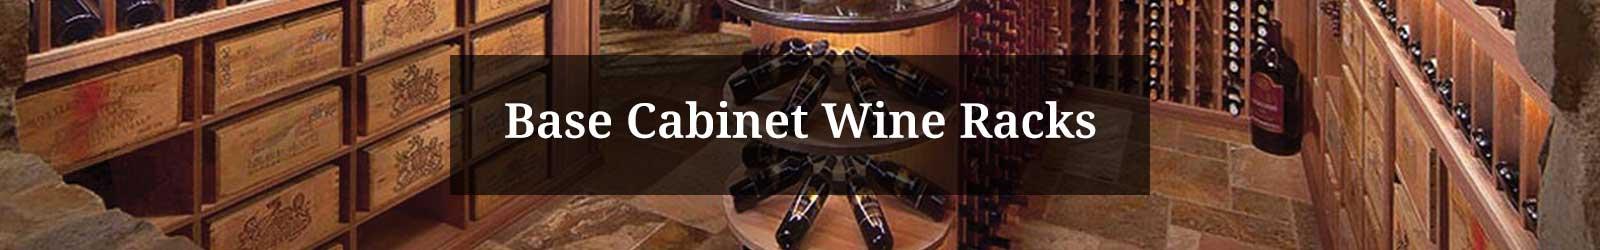 Base Cabinet Wine Racks